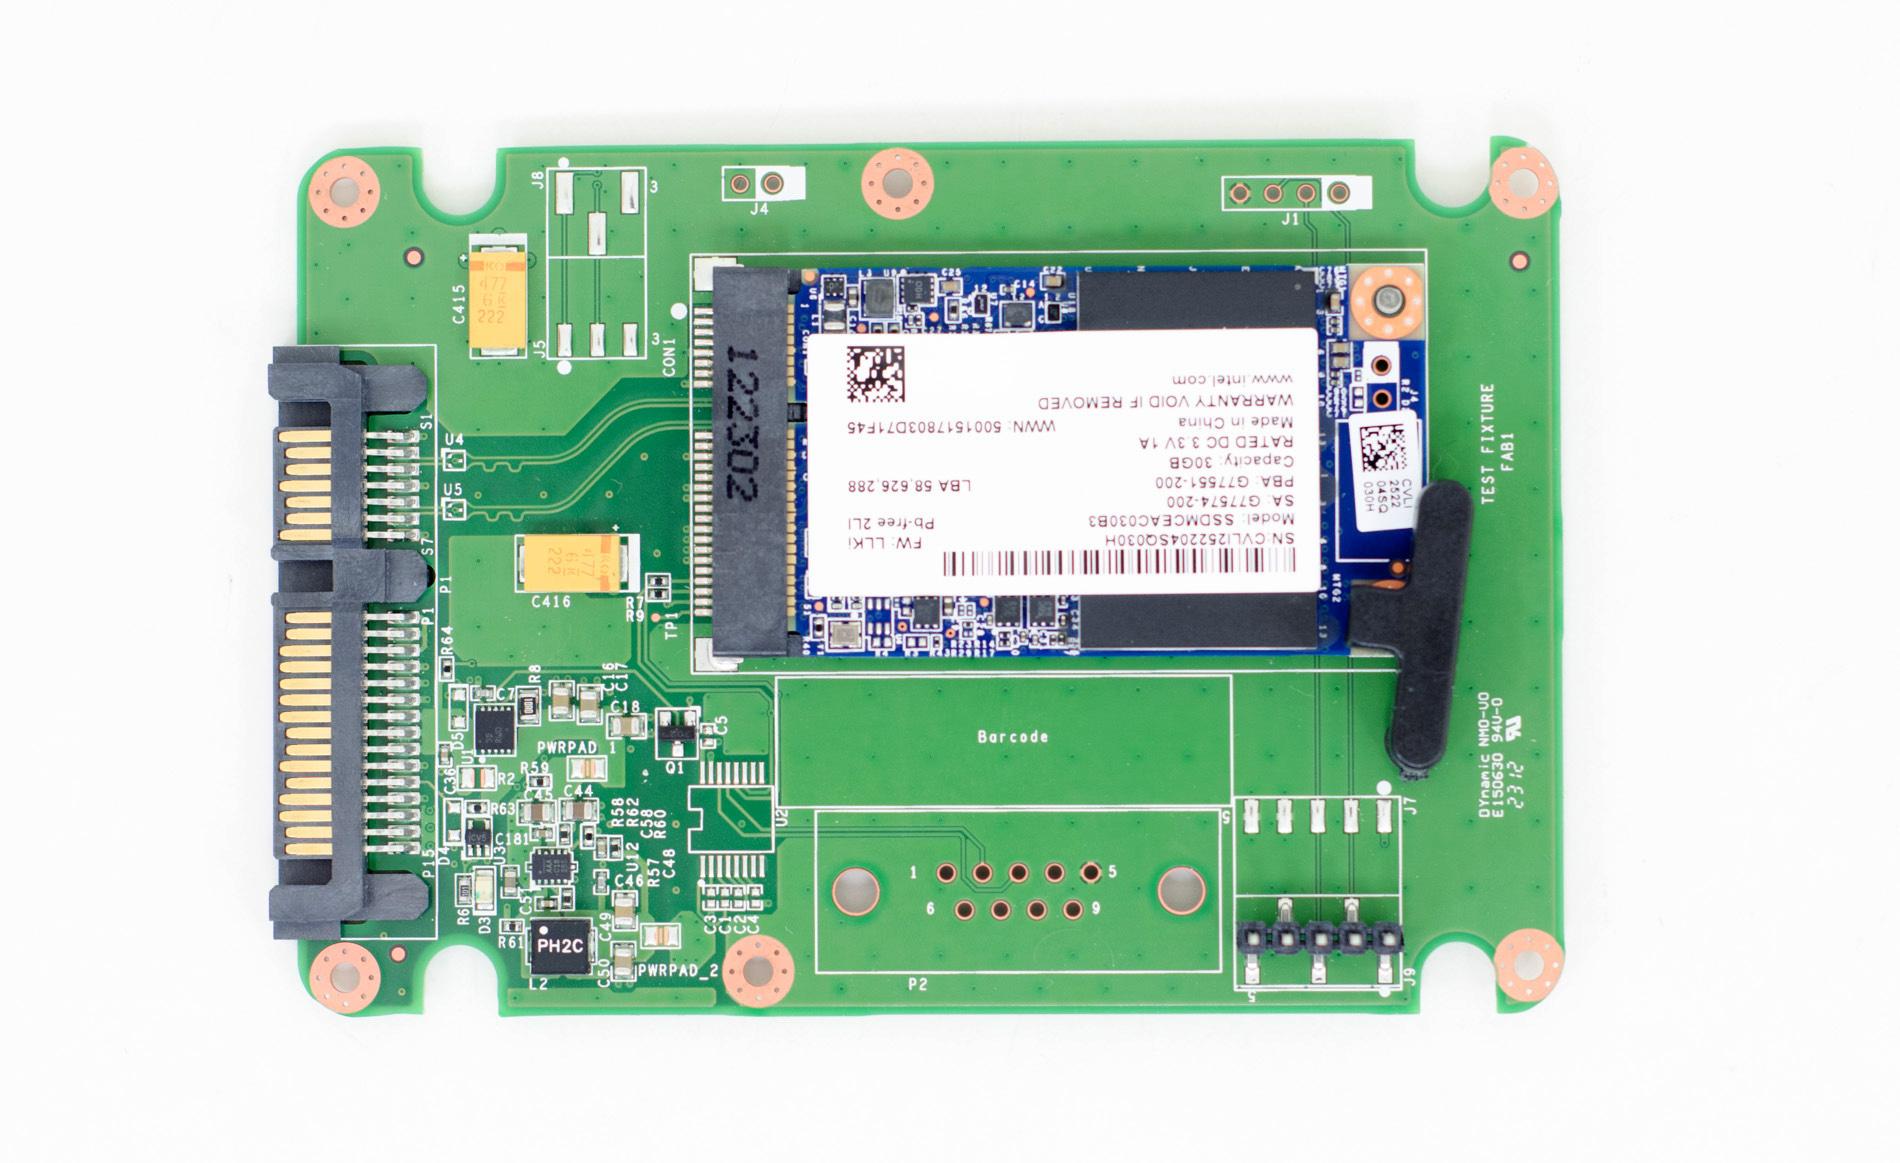 intel ssd 330 240gb review